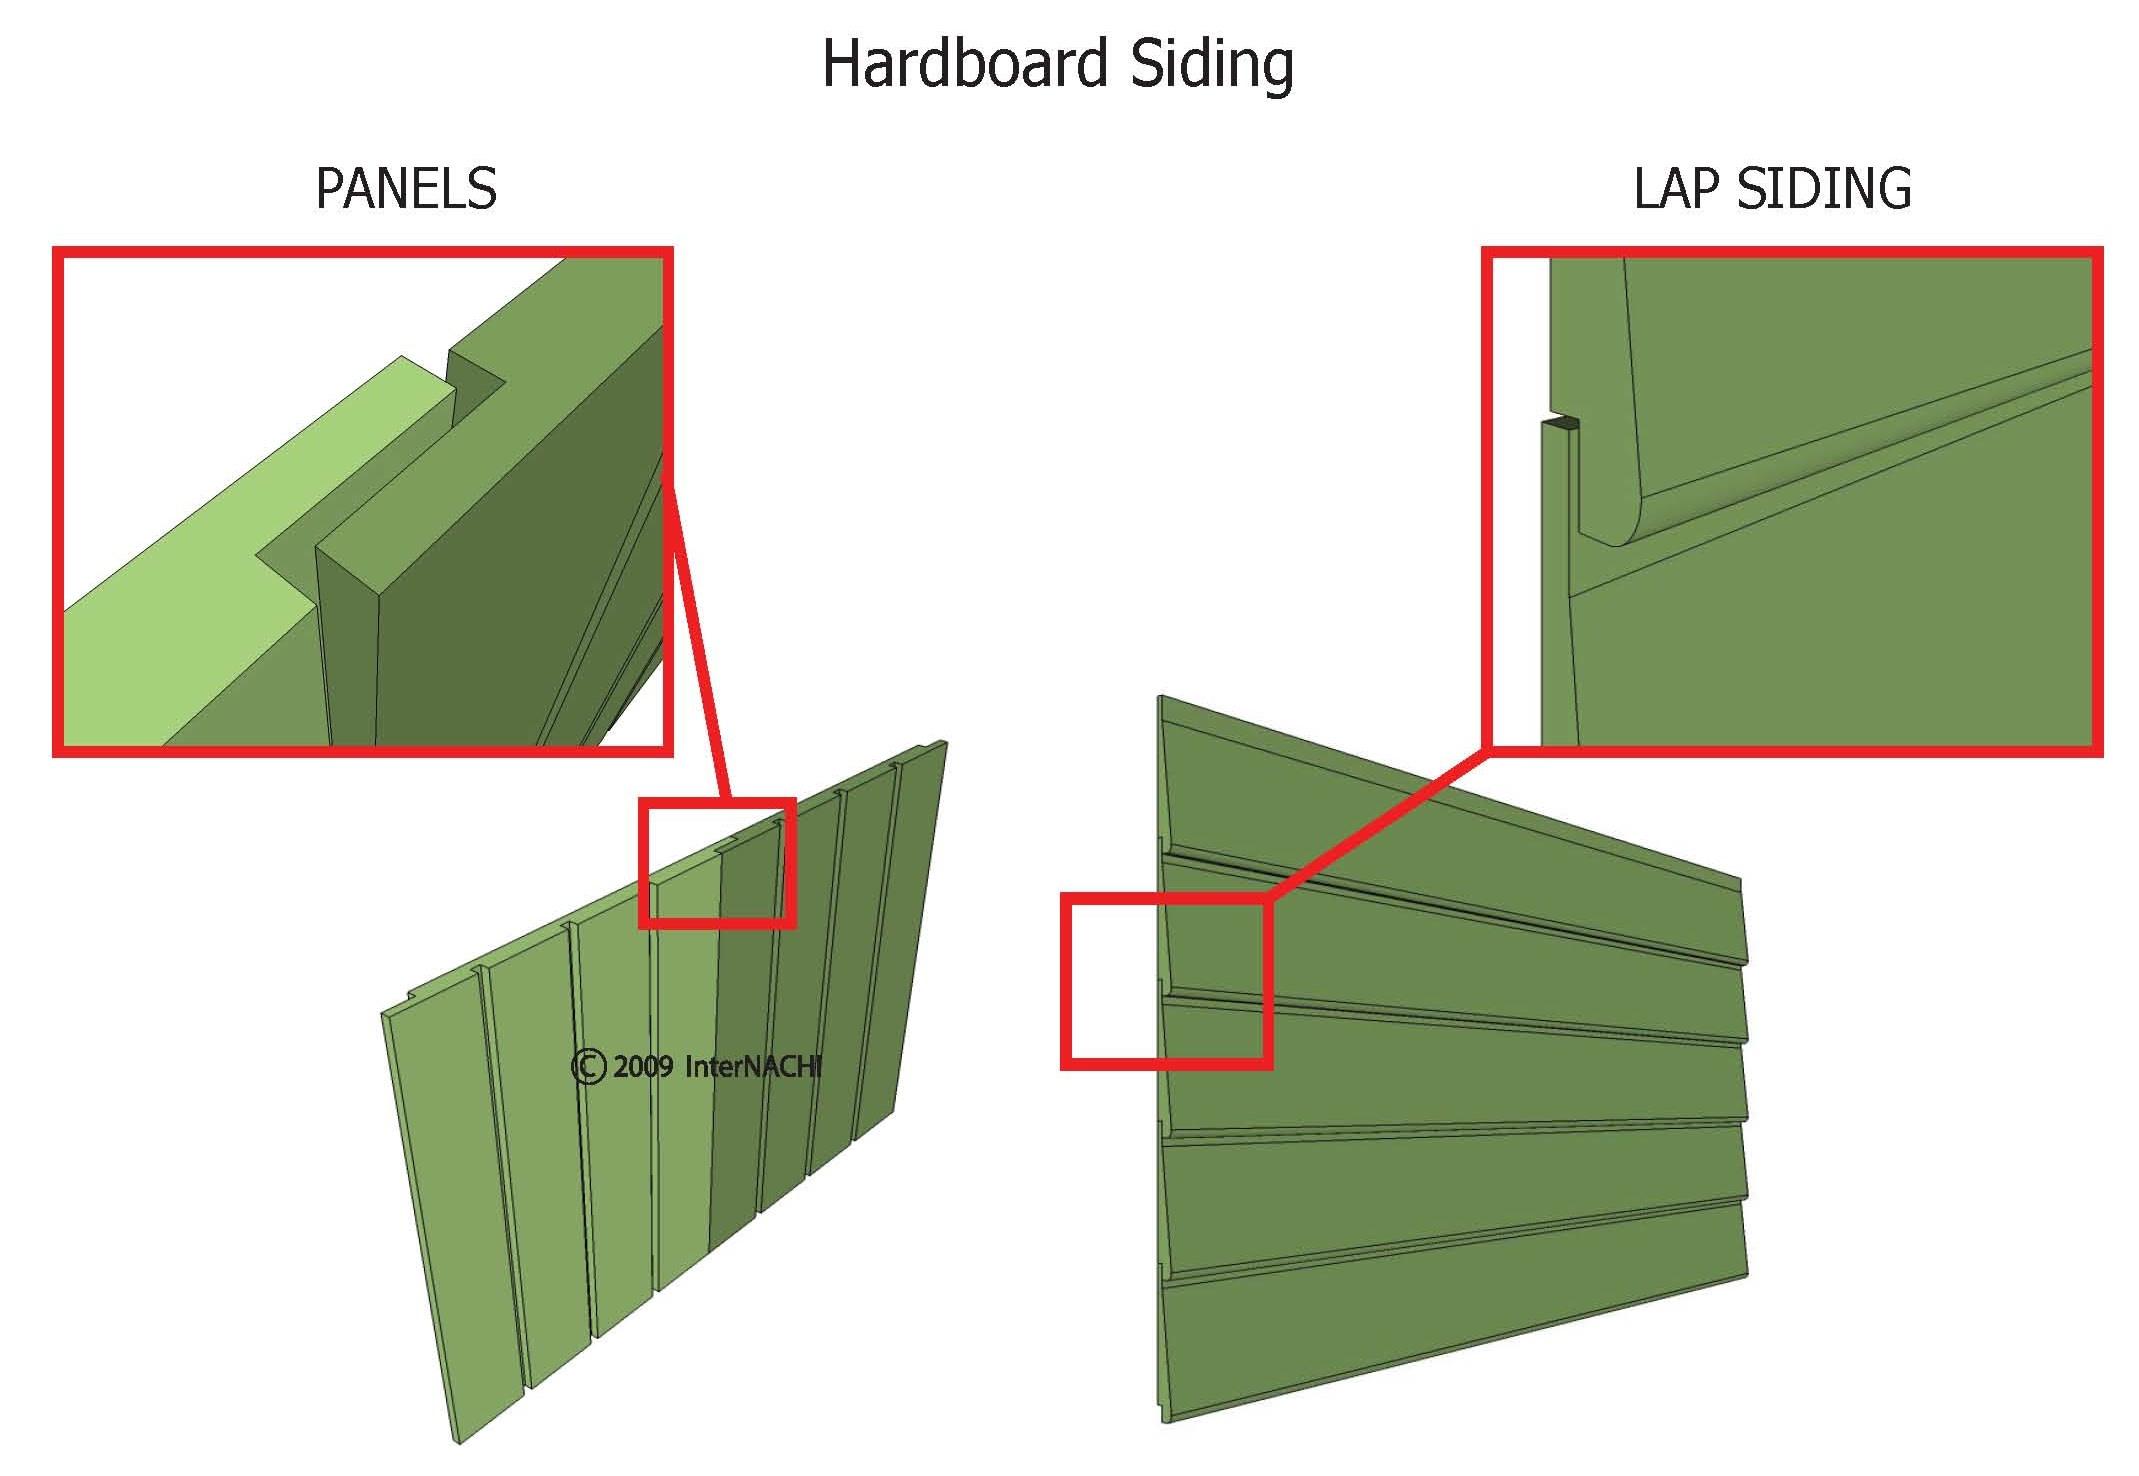 Hardboard siding.